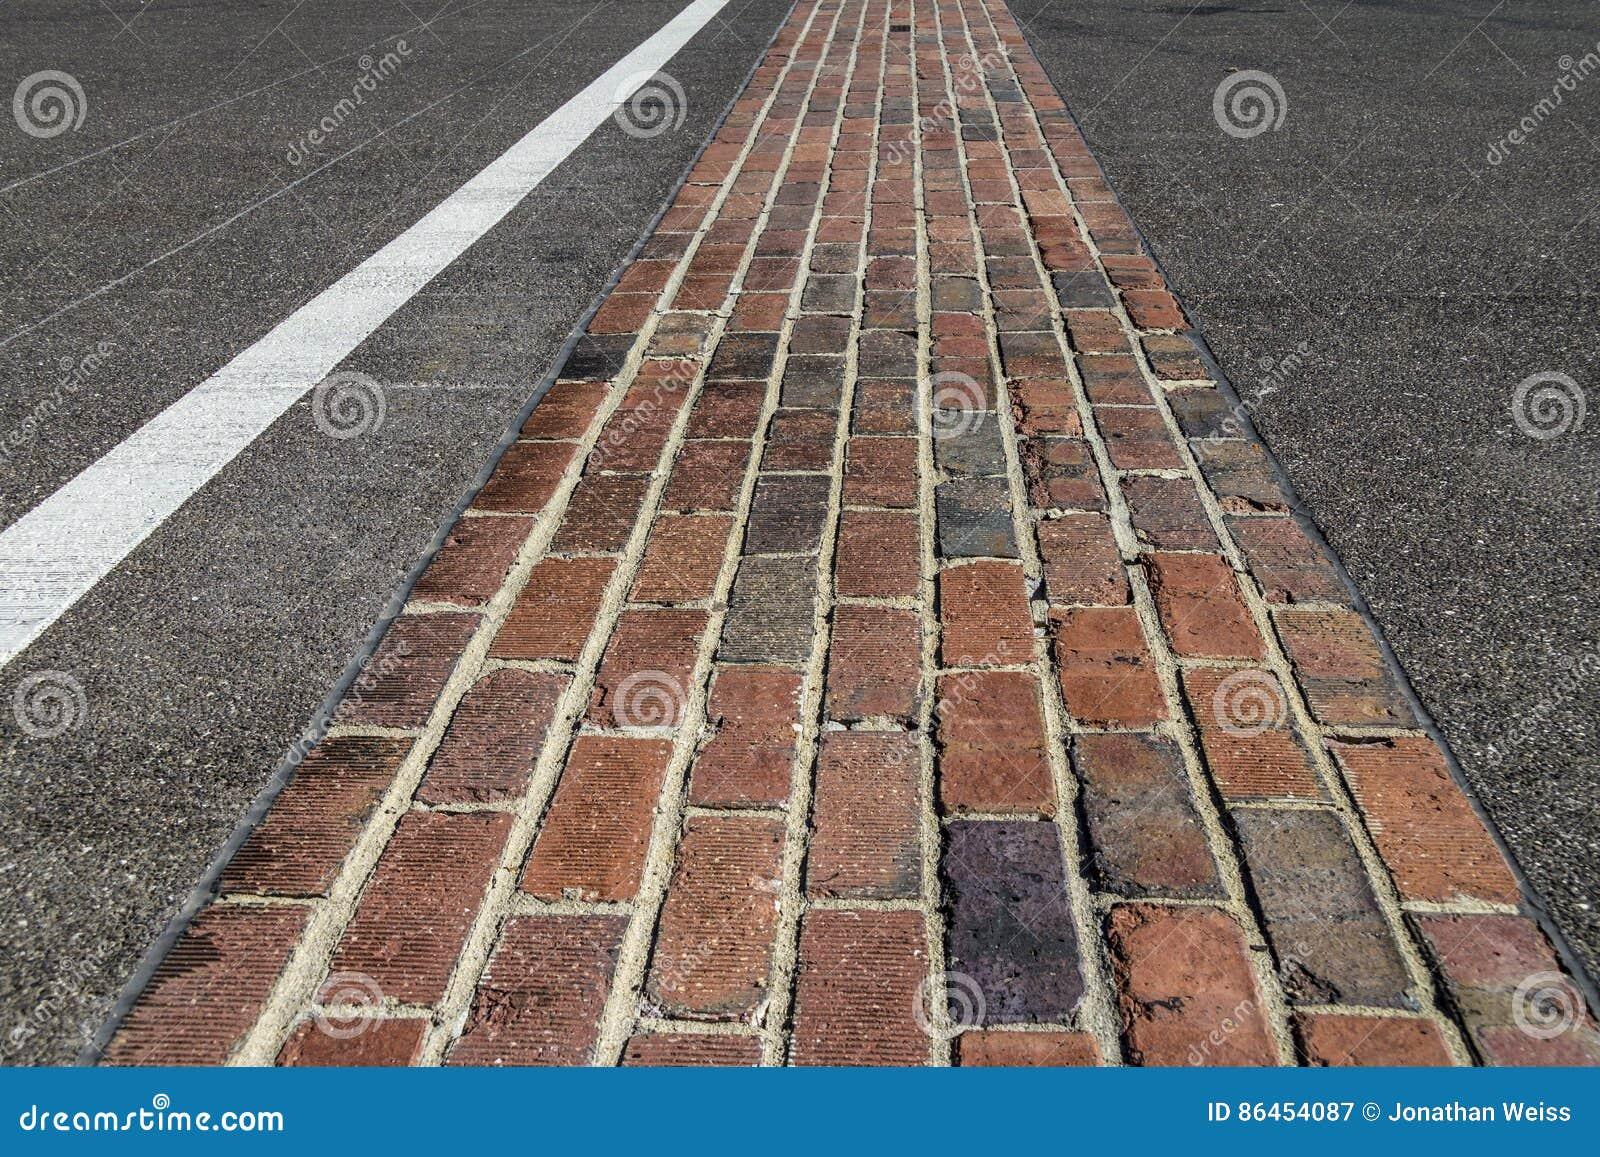 Indianapolis - Circa February 2017: The Yard of Bricks at Indianapolis Motor Speedway I